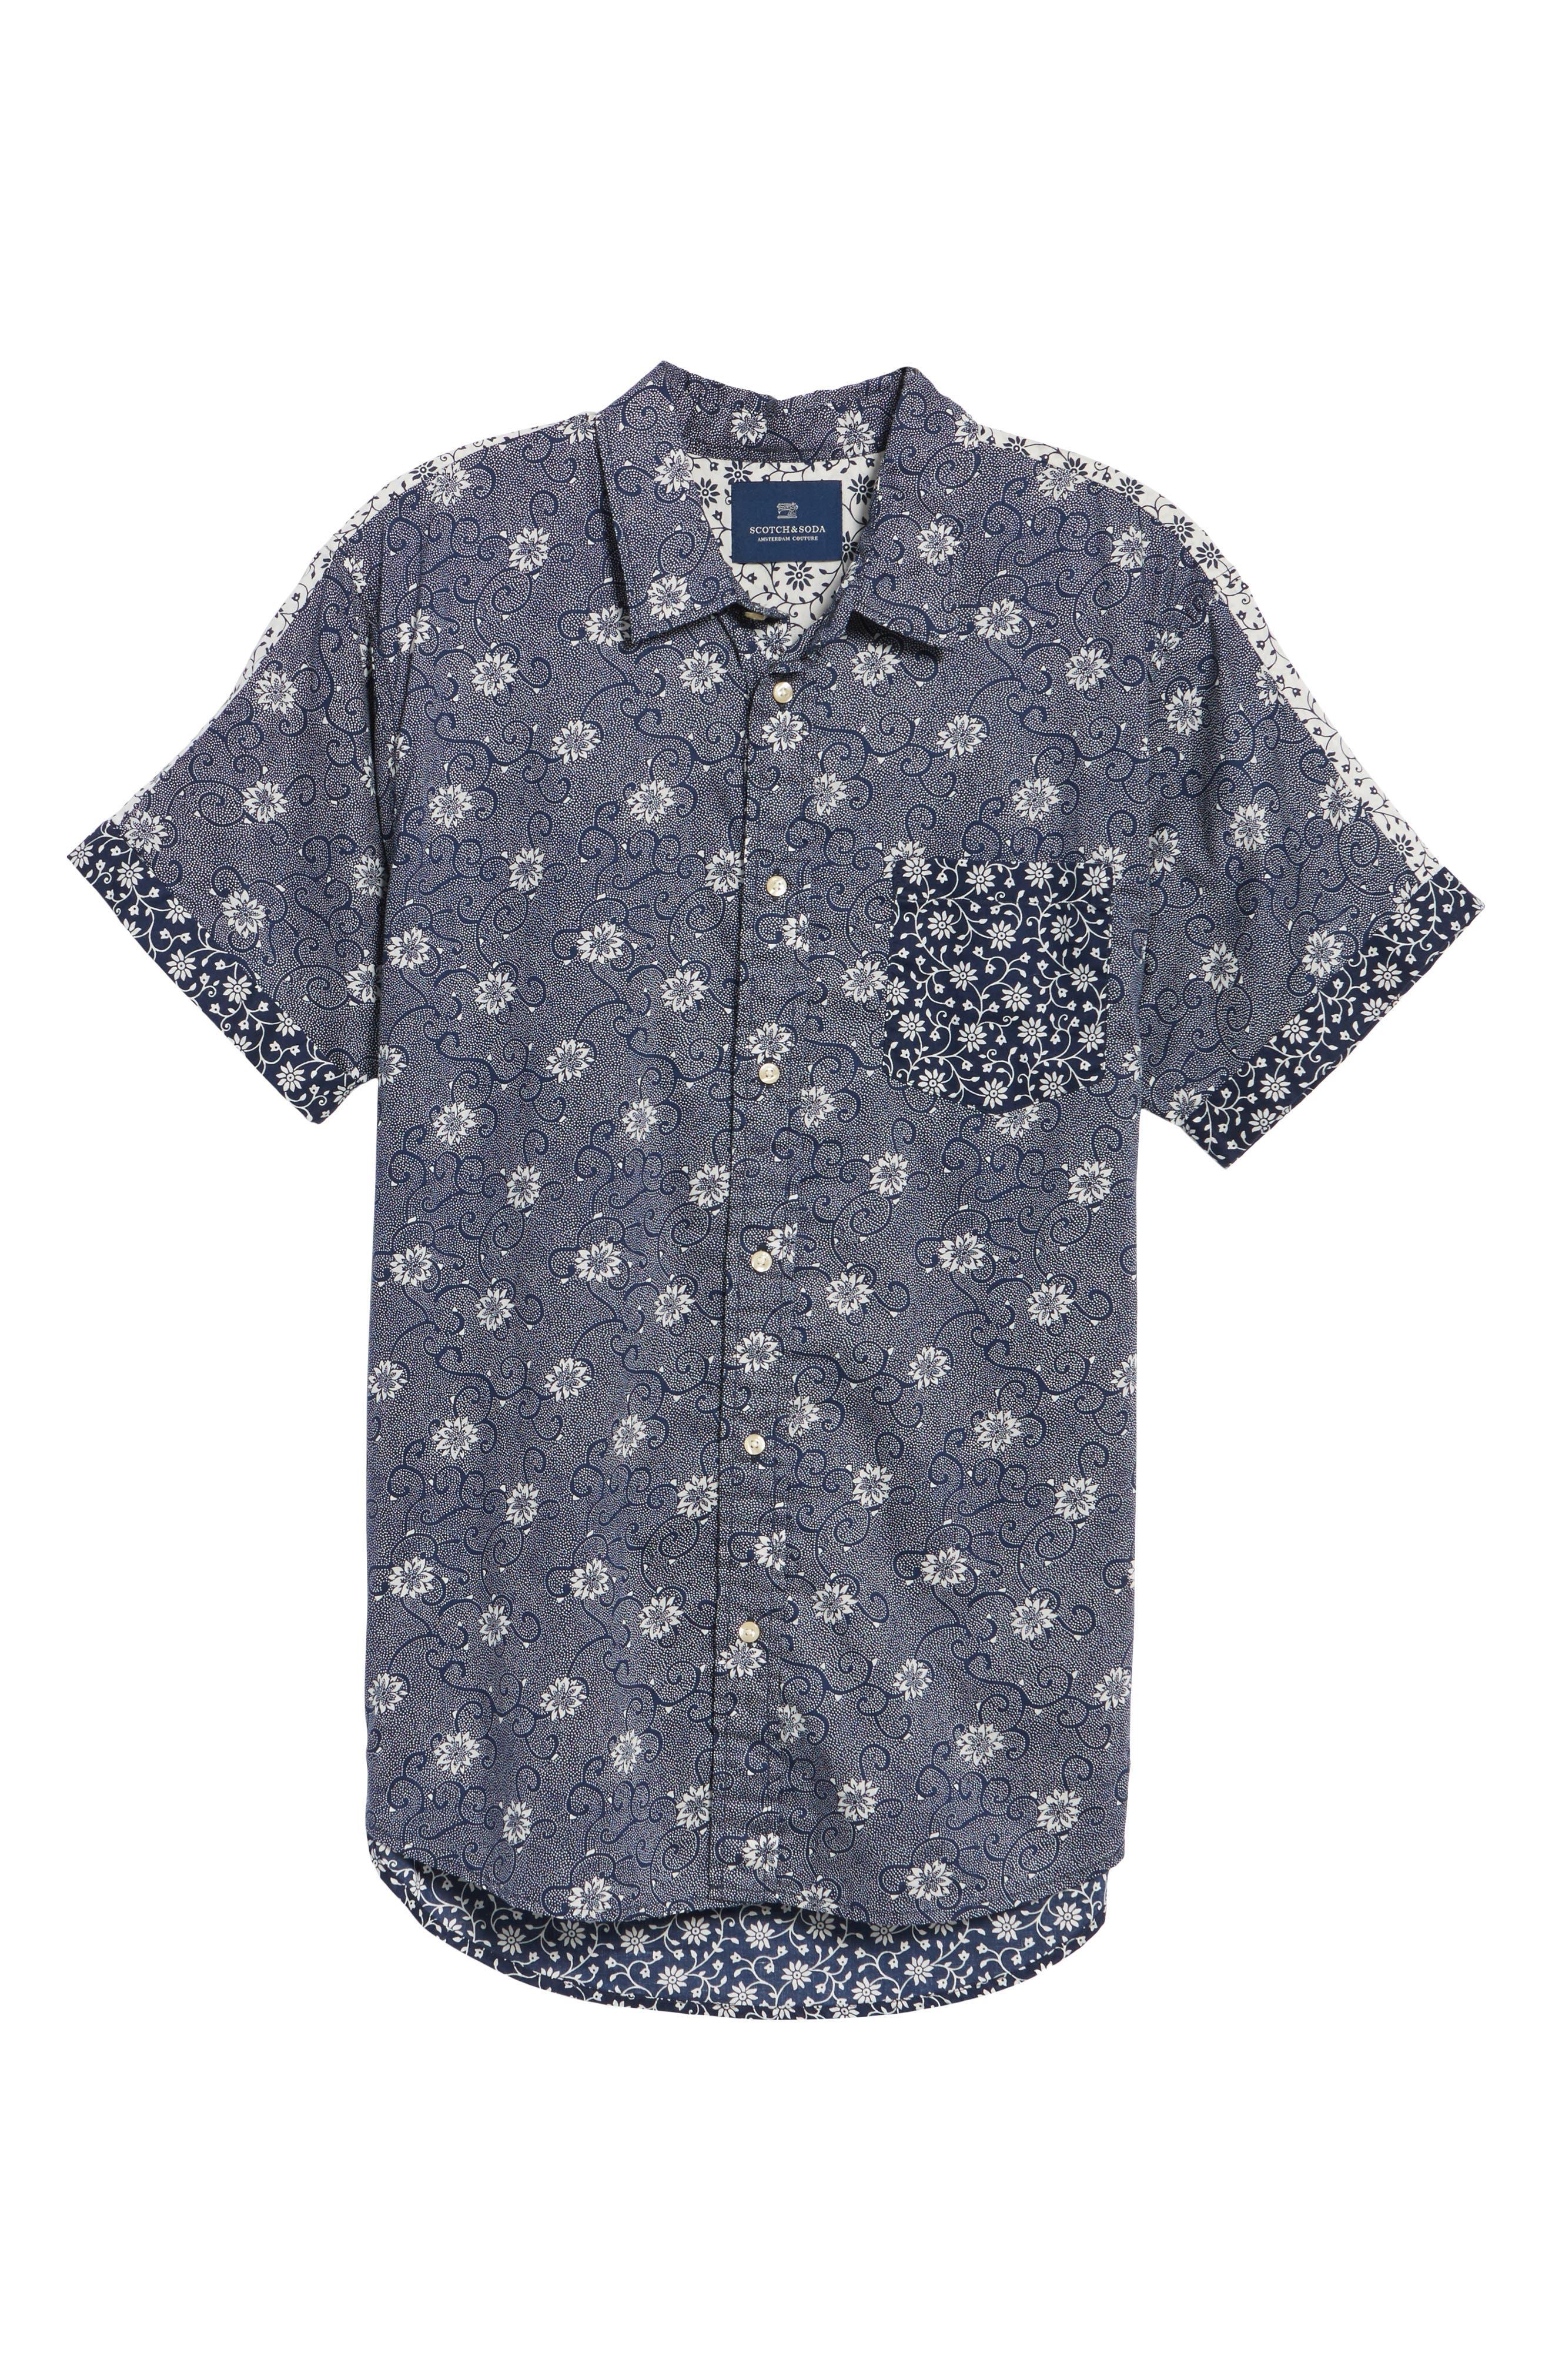 Mix & Match Print Woven Shirt,                             Alternate thumbnail 6, color,                             410